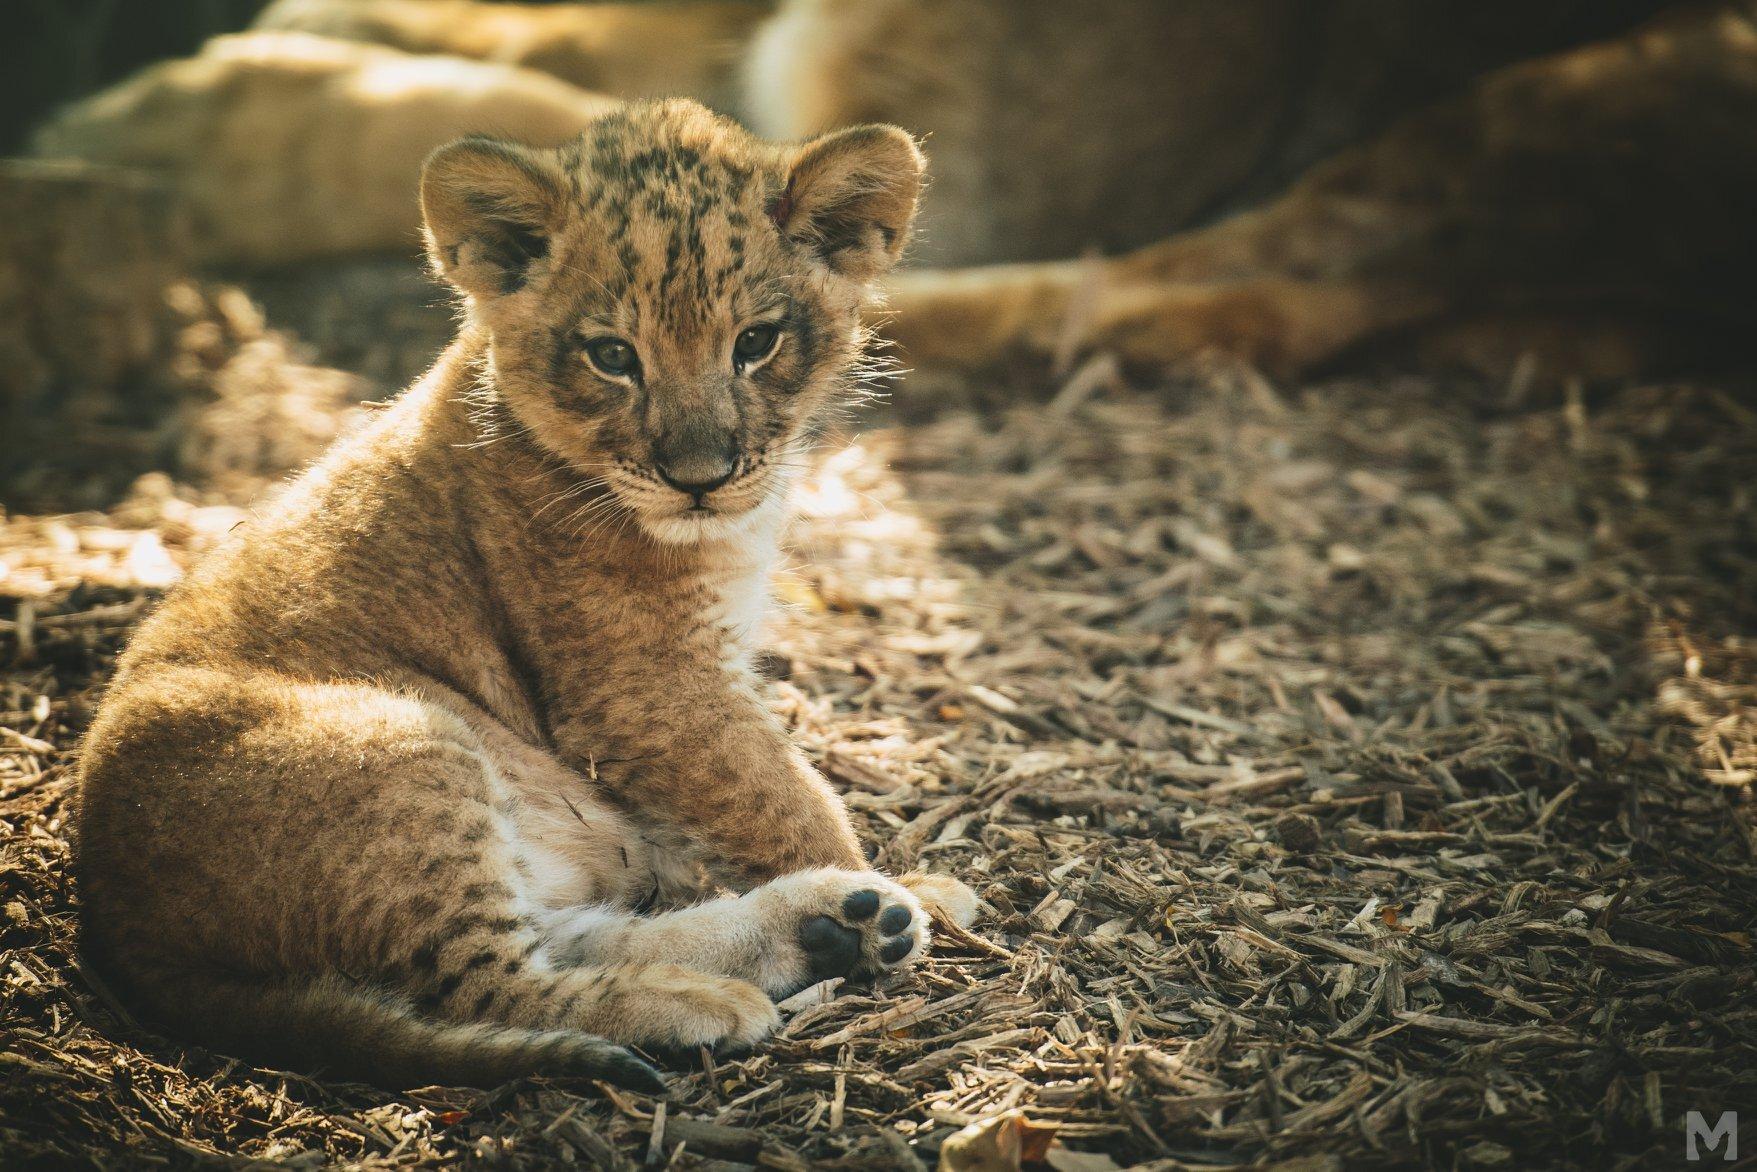 Lion Cub_10_Molly McCormick.jpg